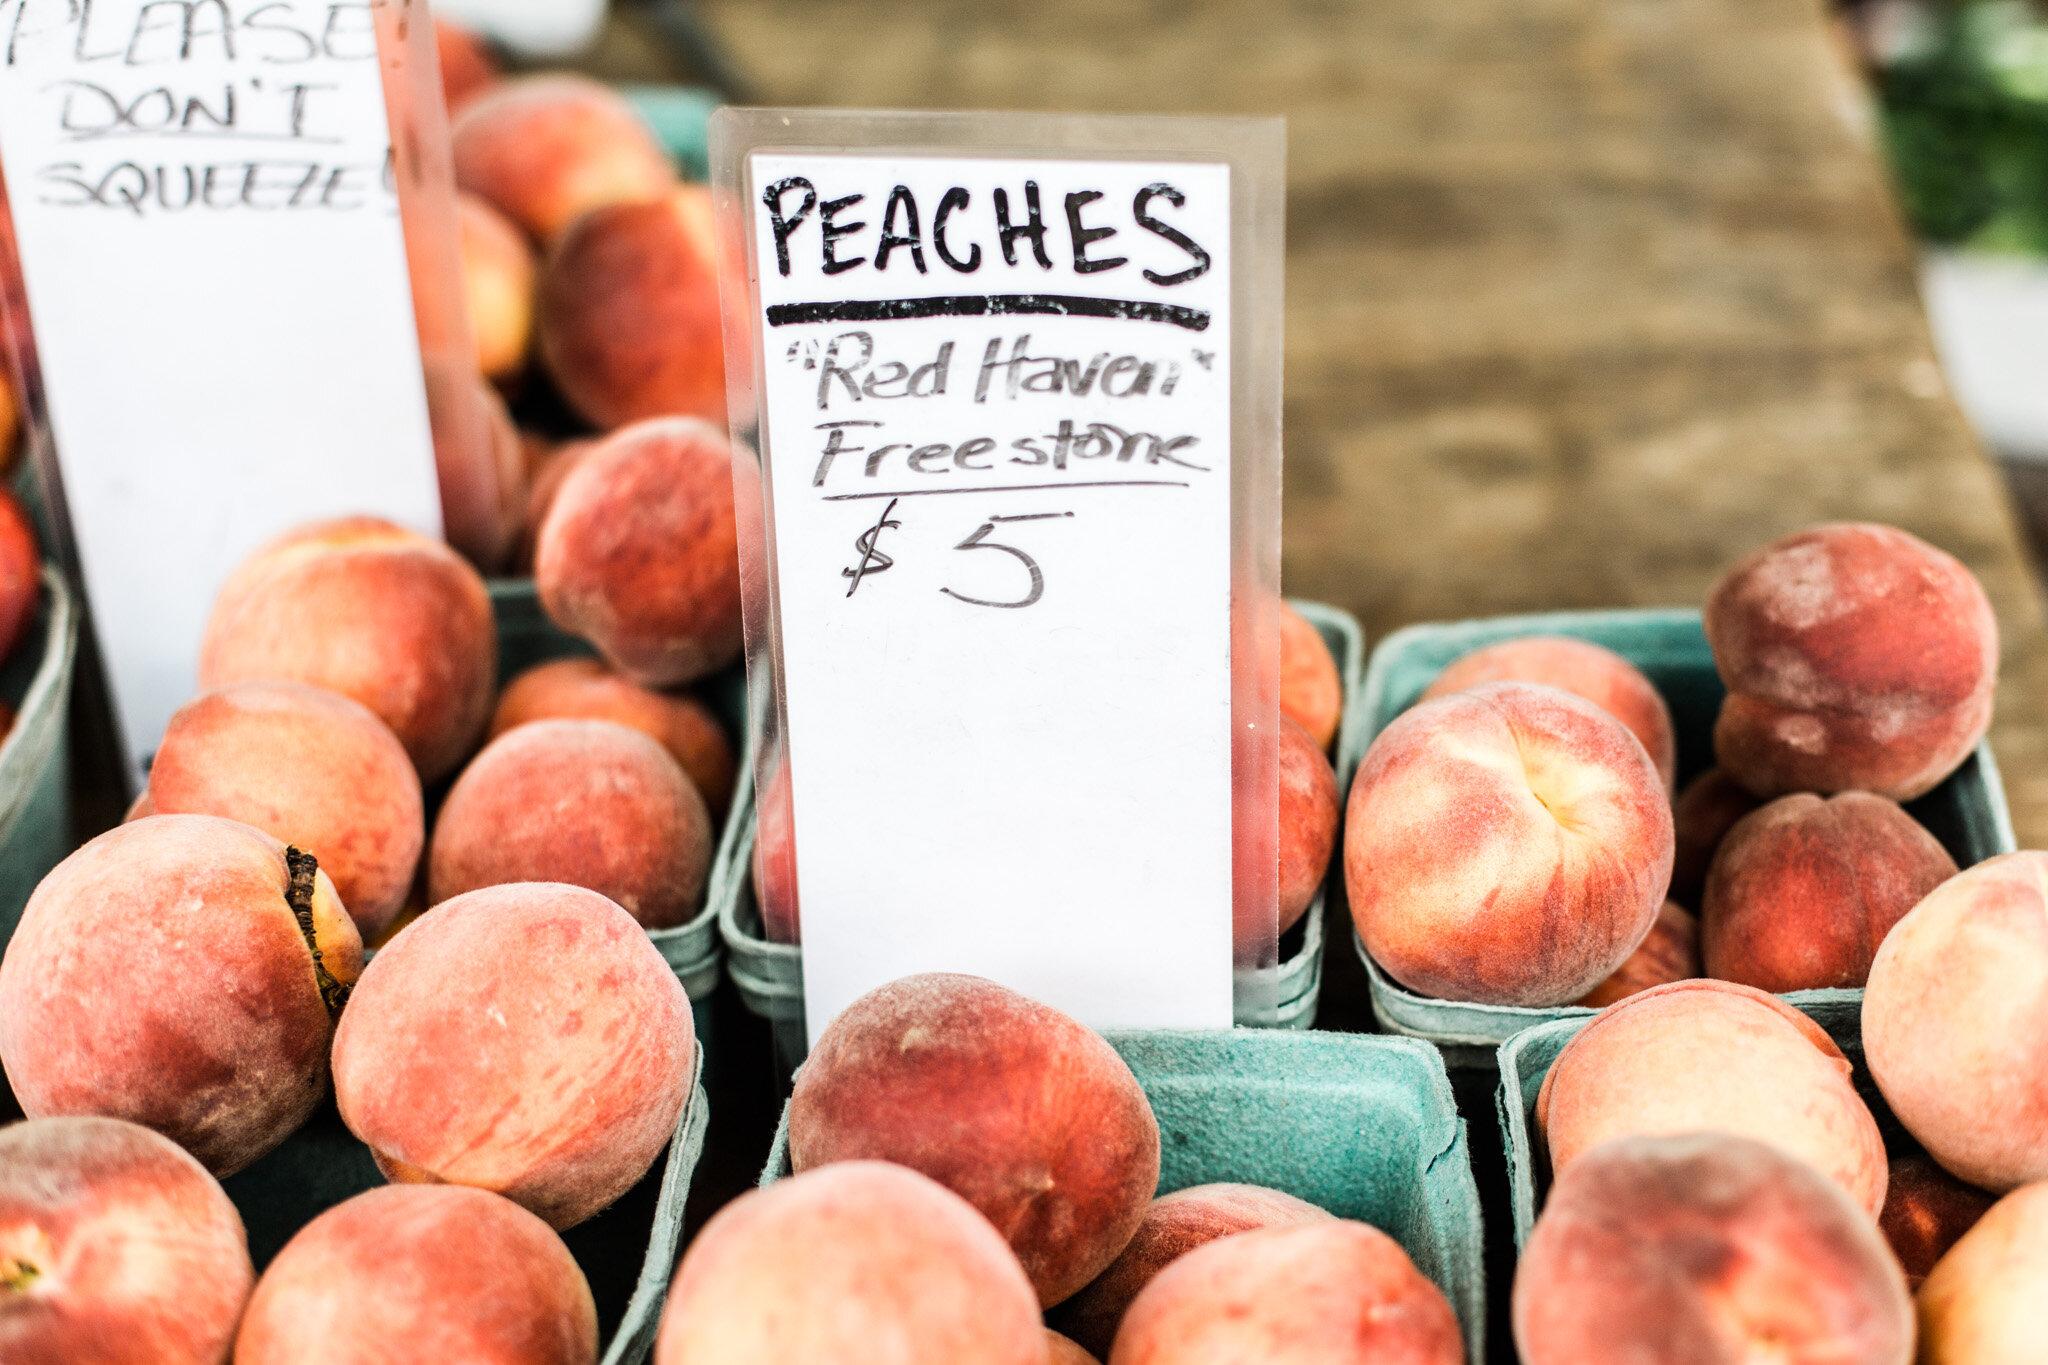 HCFM-Aug-Markets-2019-WEB-2.jpg